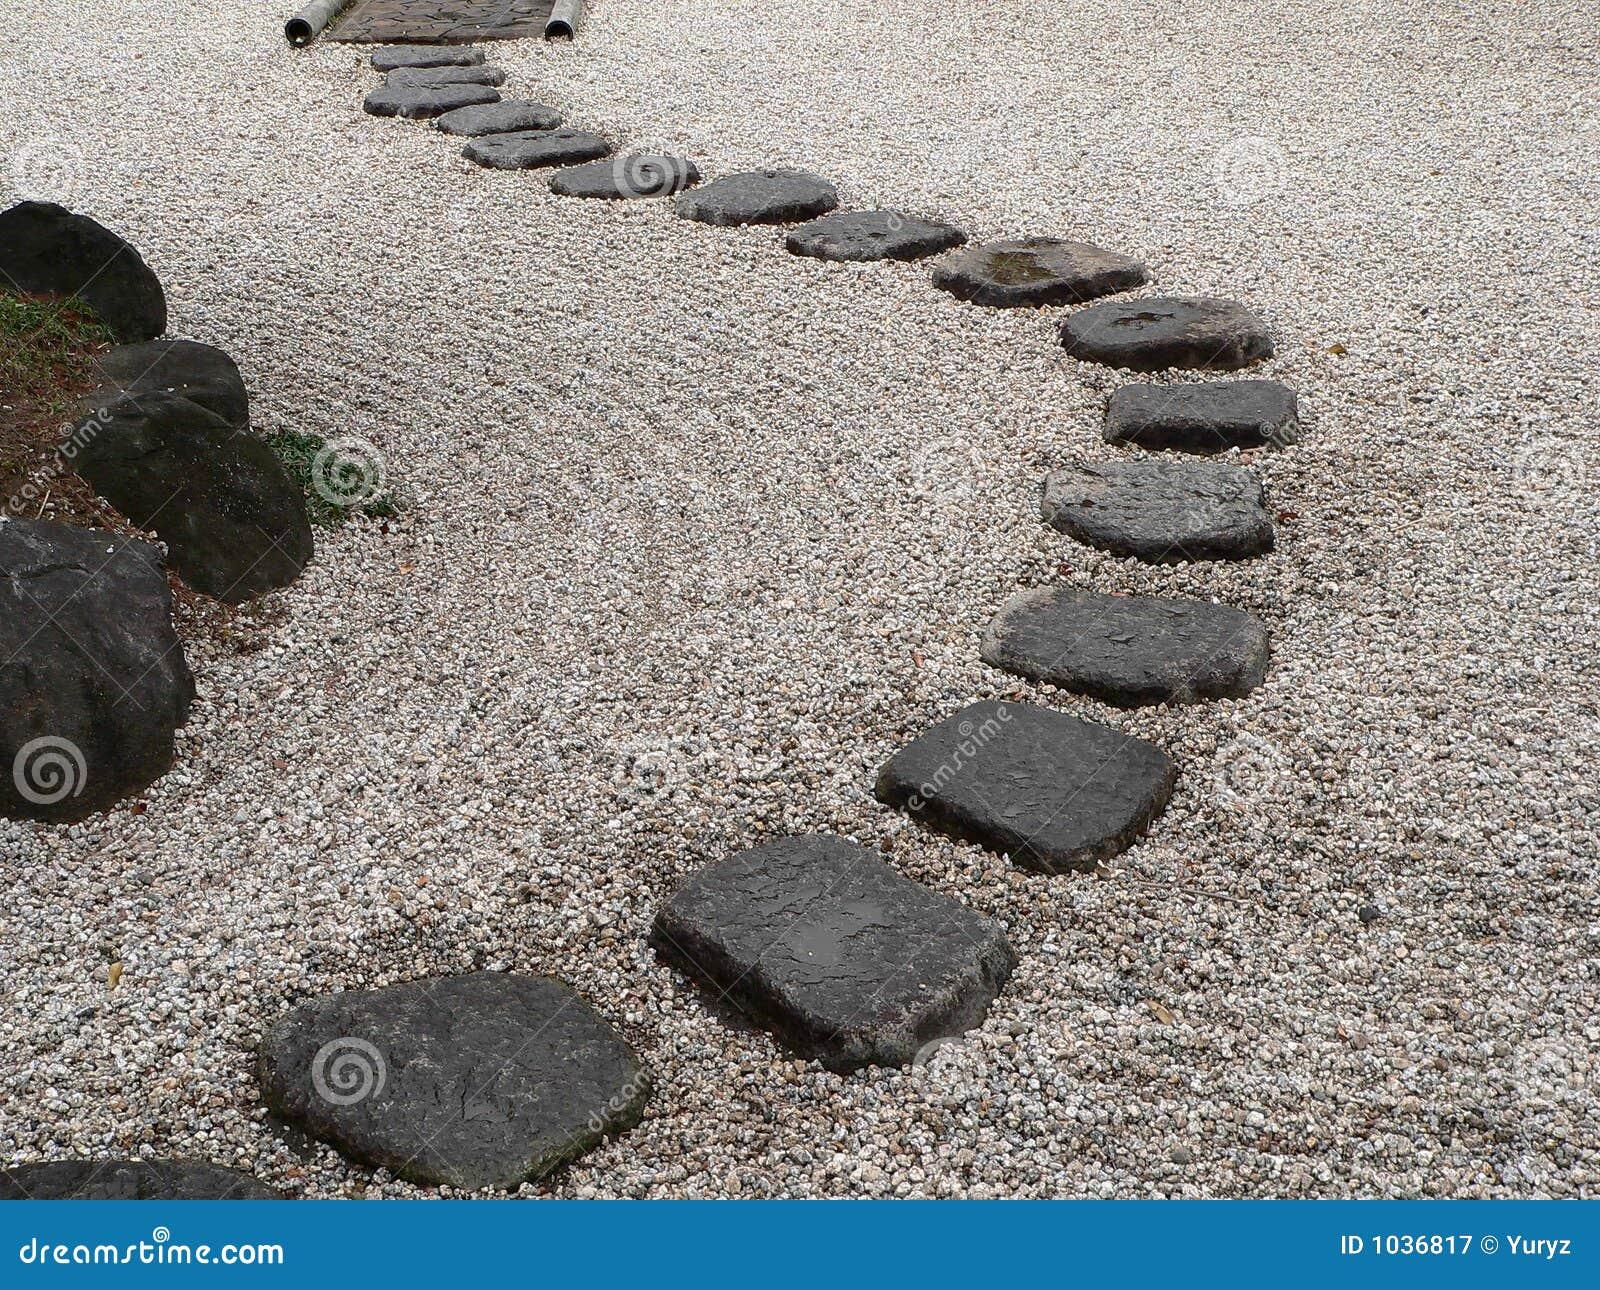 japanischer steingarten lizenzfreie stockfotografie - bild: 1036817, Garten ideen